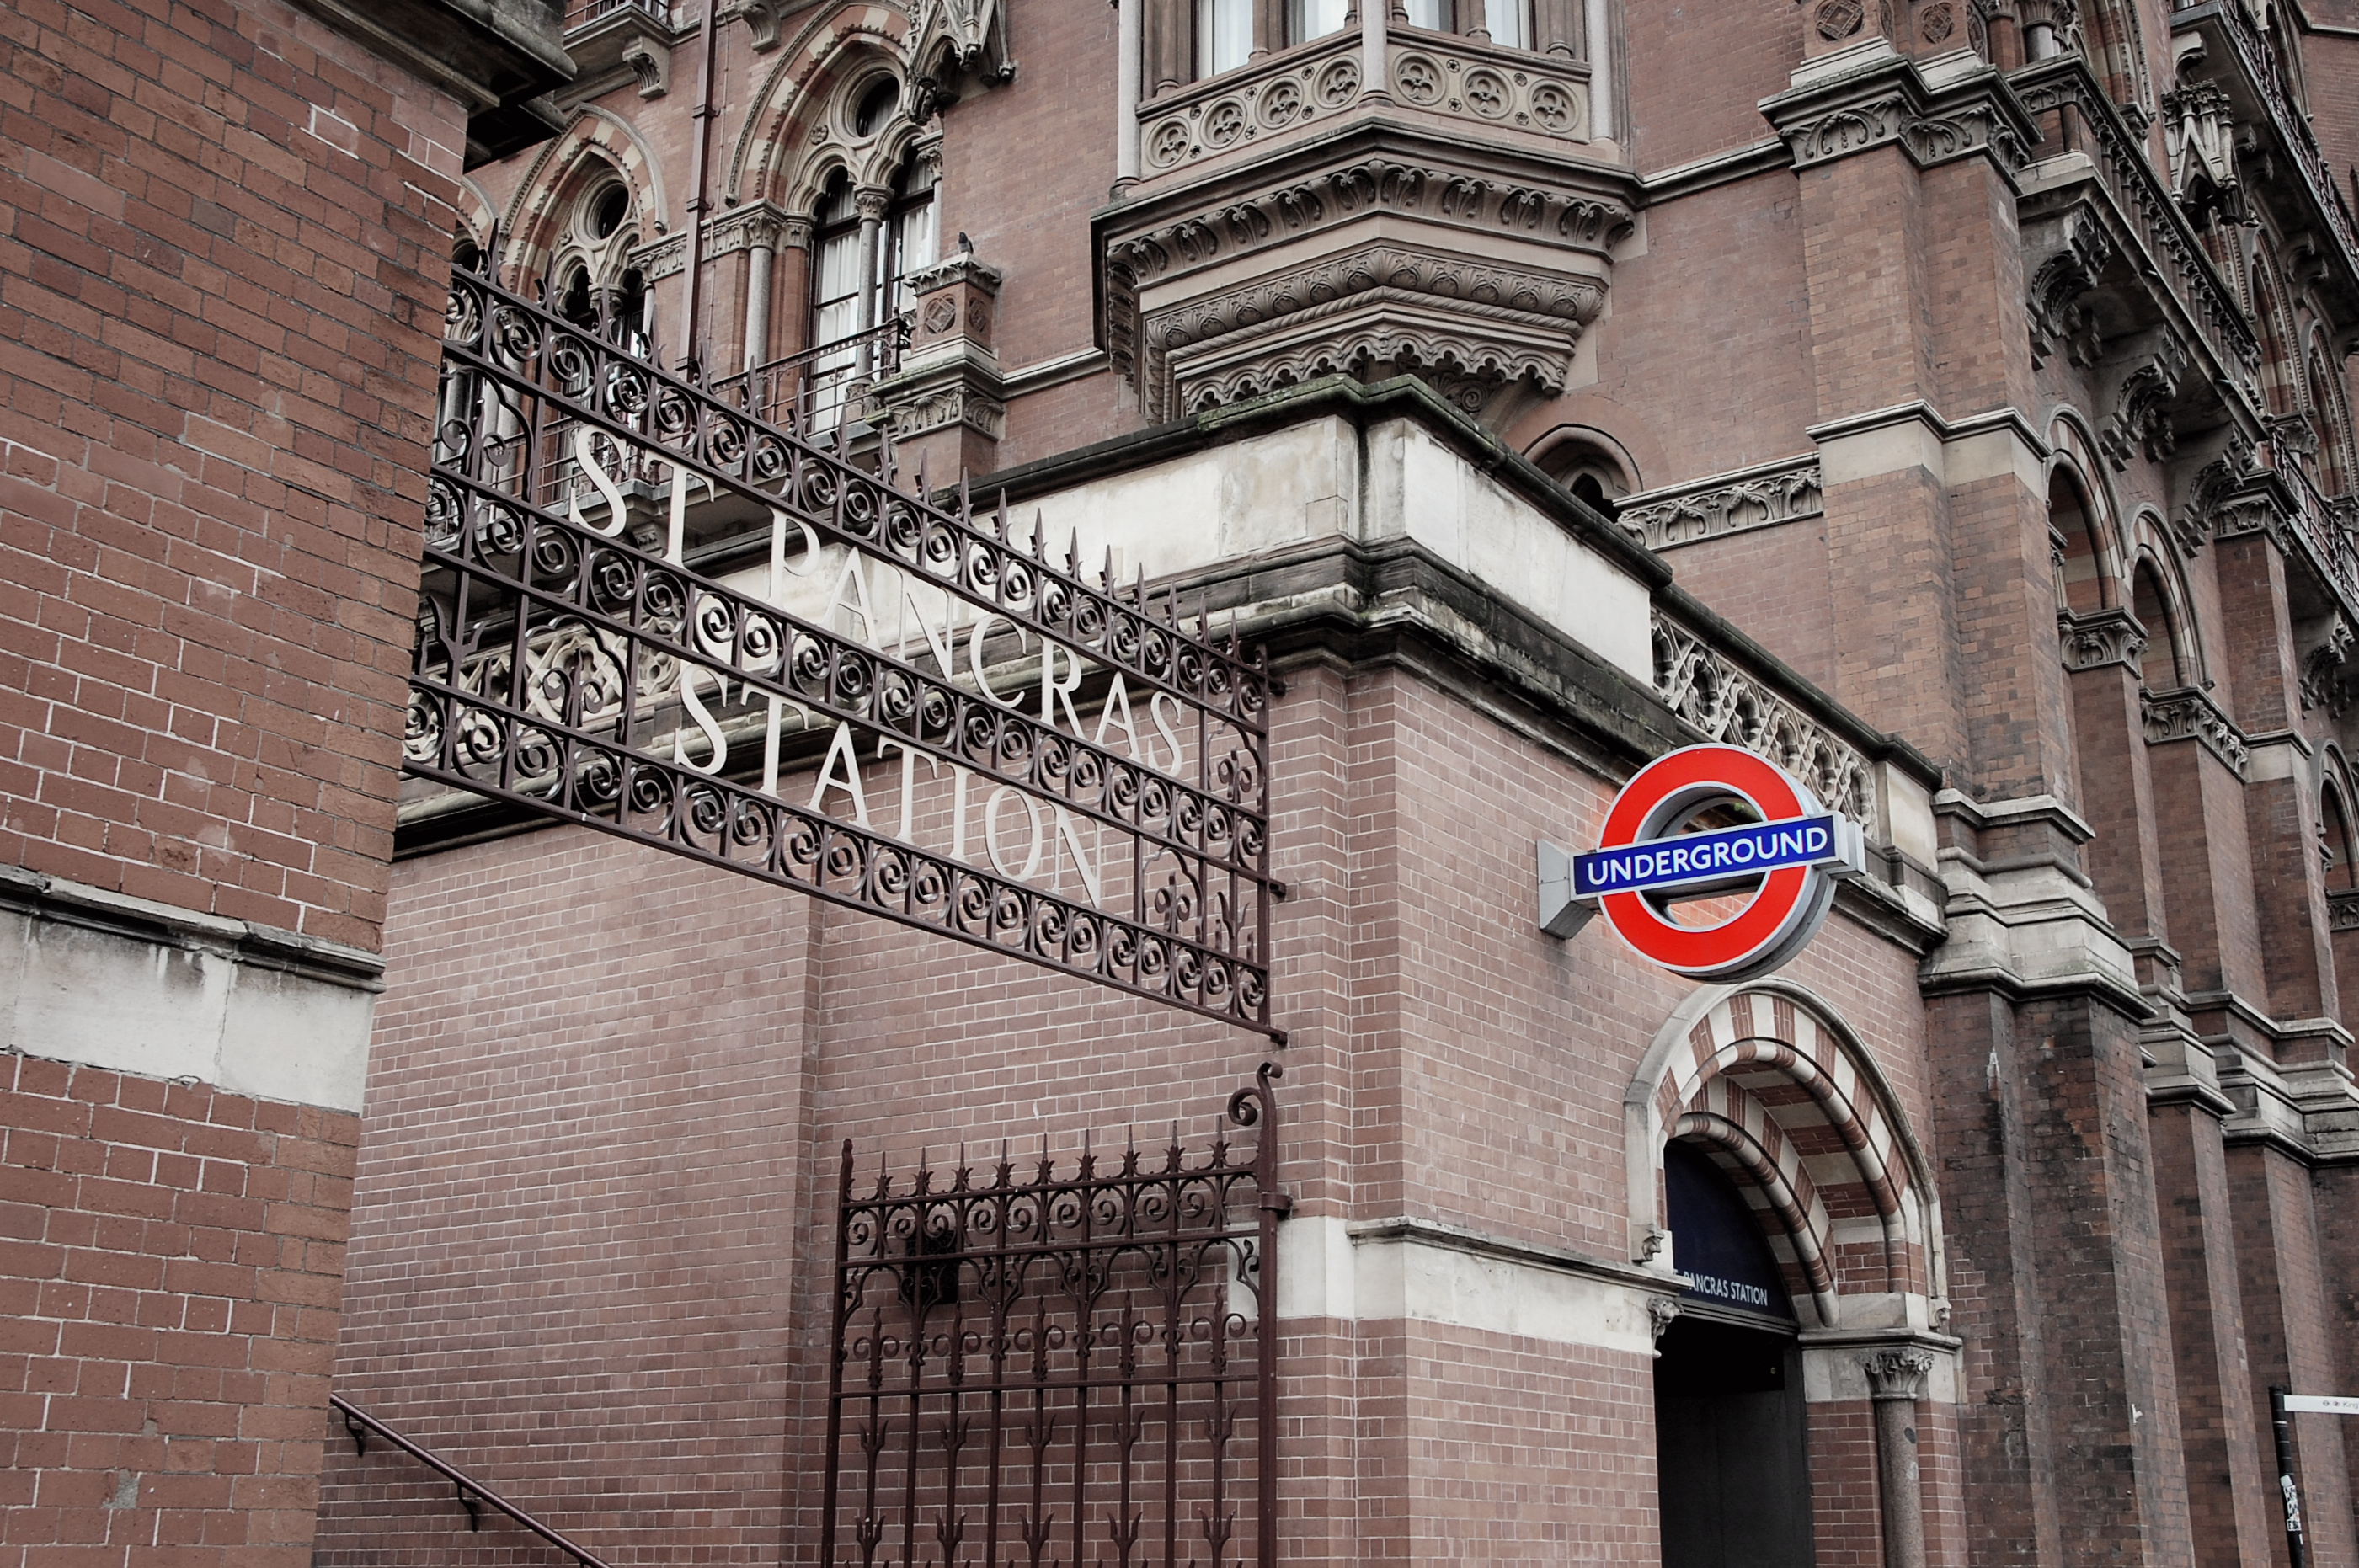 Underground sign at St Pancras Station London